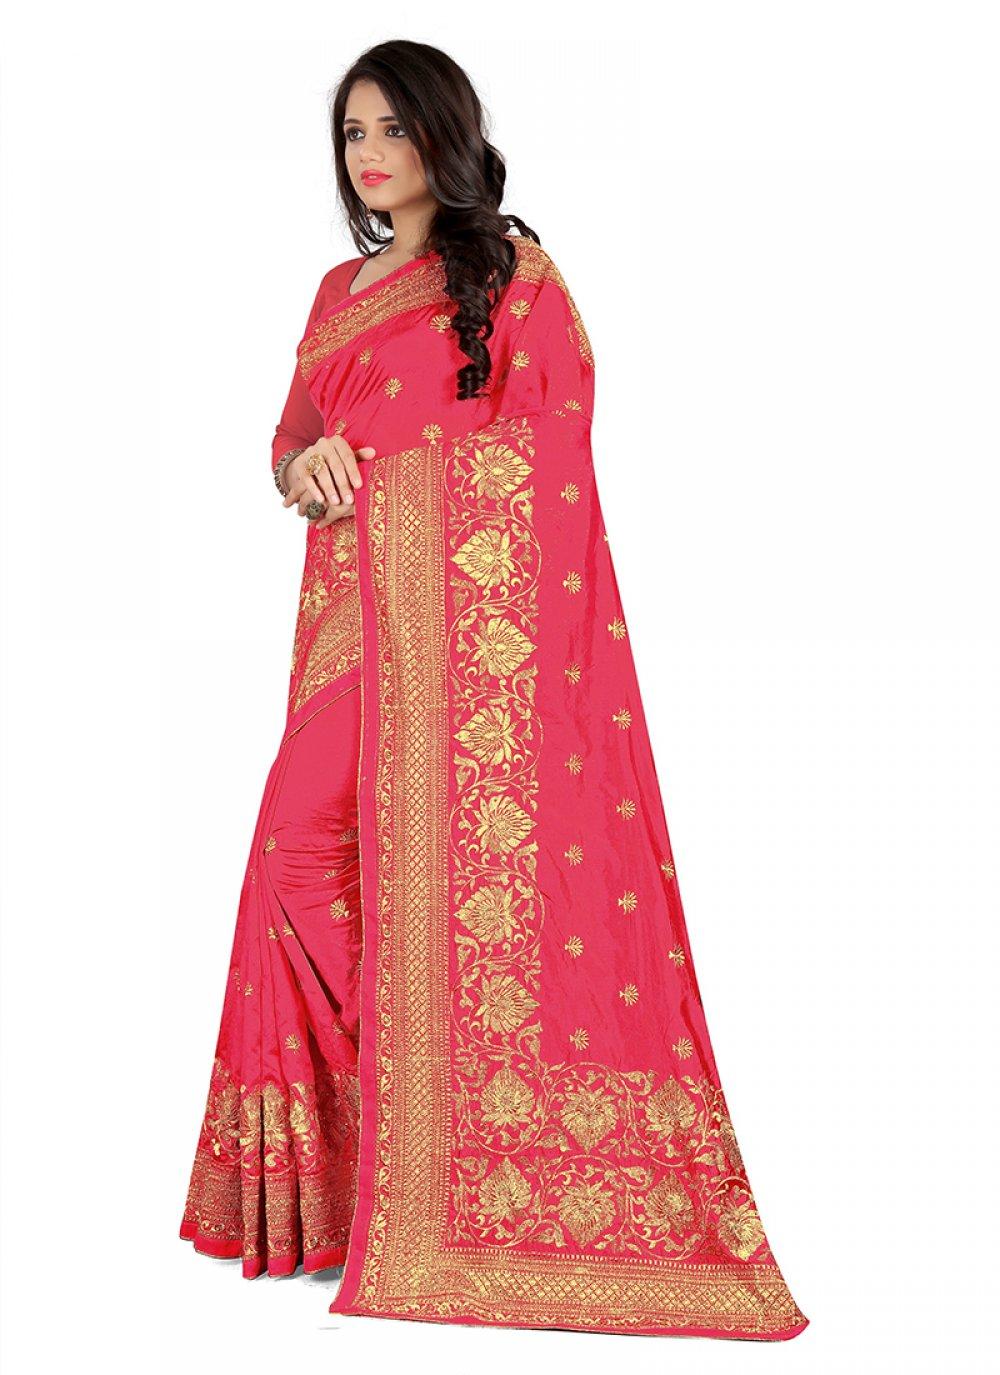 Embroidered Fuchsia Art Silk Silk Saree